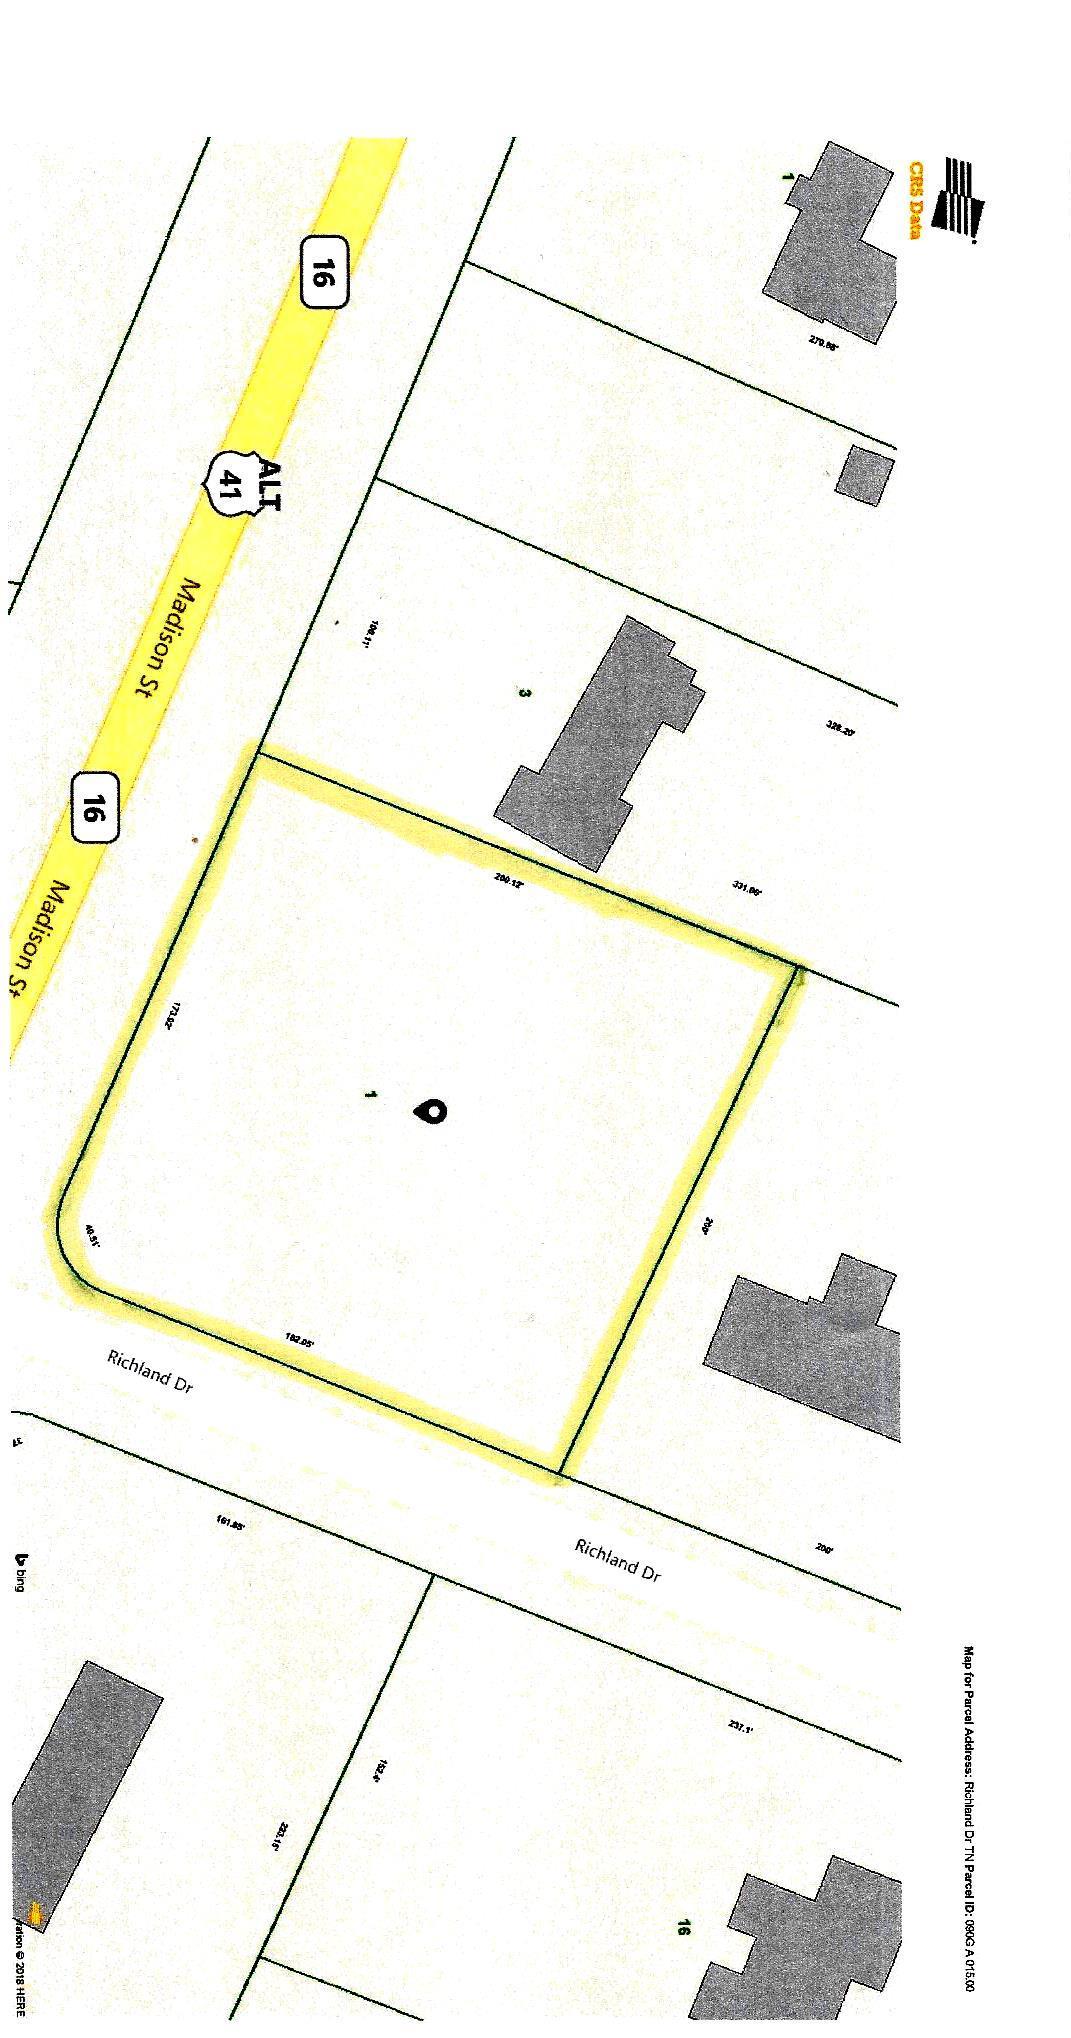 0 Richland Dr., Shelbyville, TN 37160 - Shelbyville, TN real estate listing